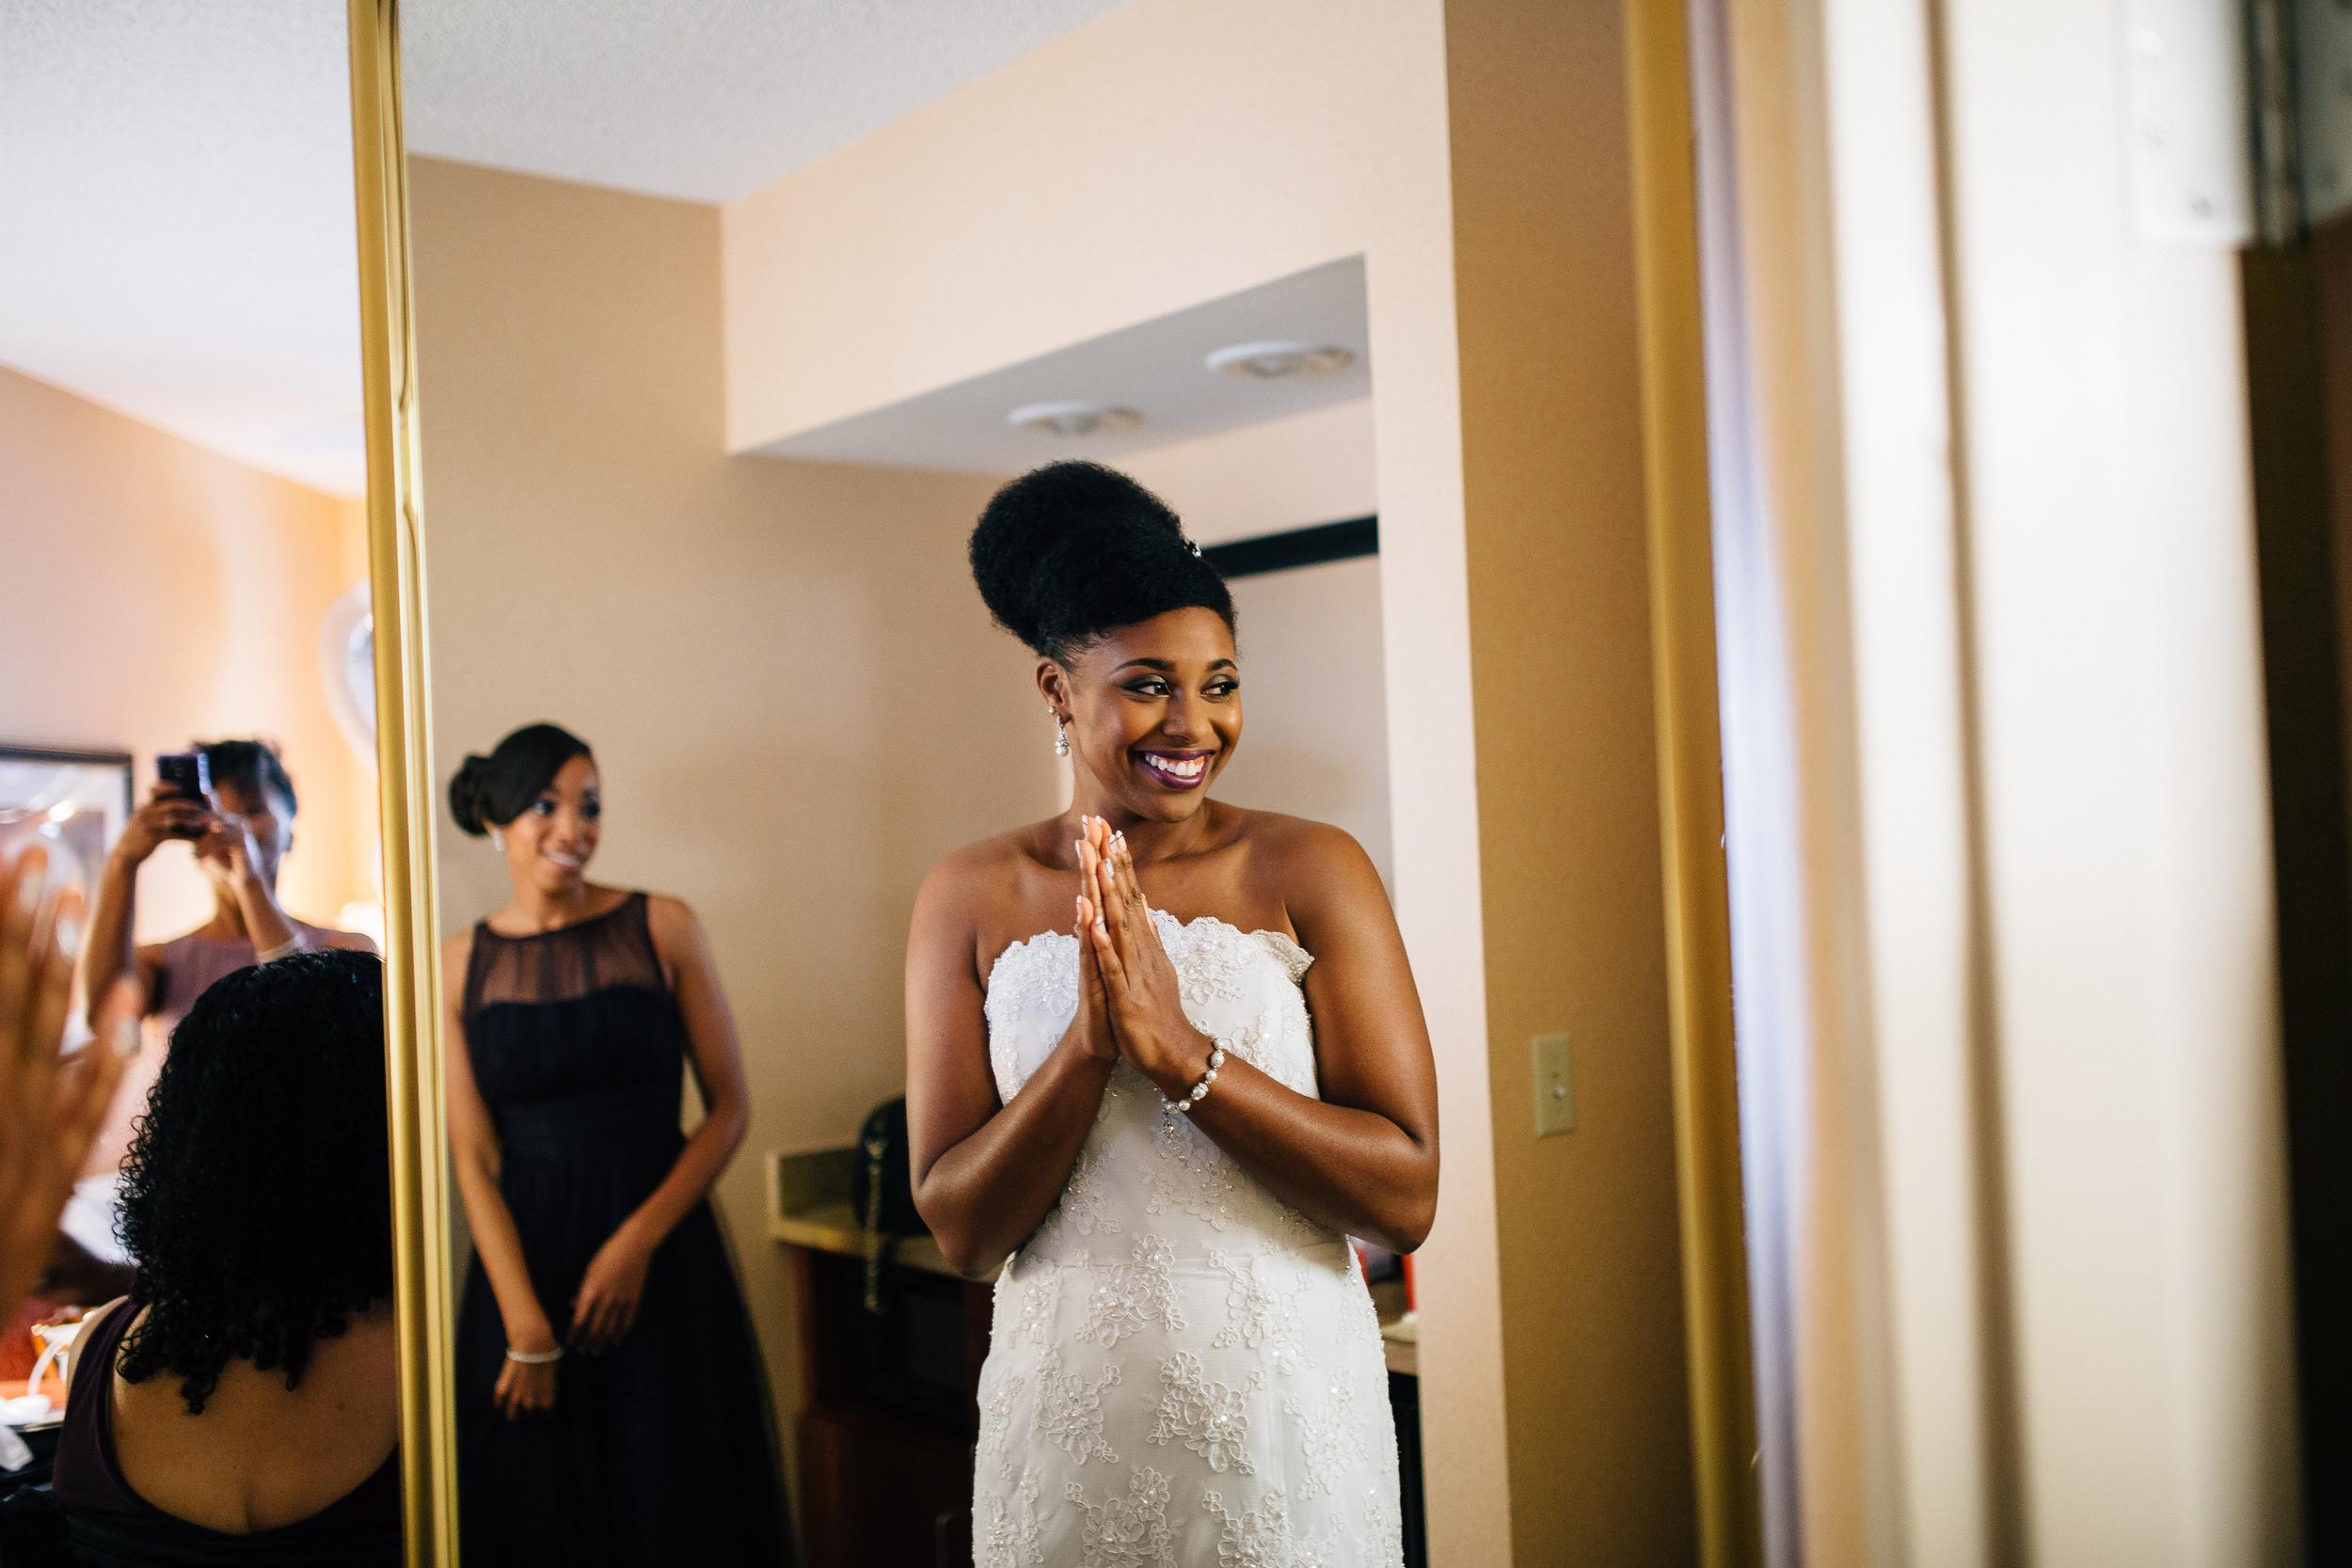 Chuck & Alicia's Wedding - Corrie Mick Photography-152.jpg